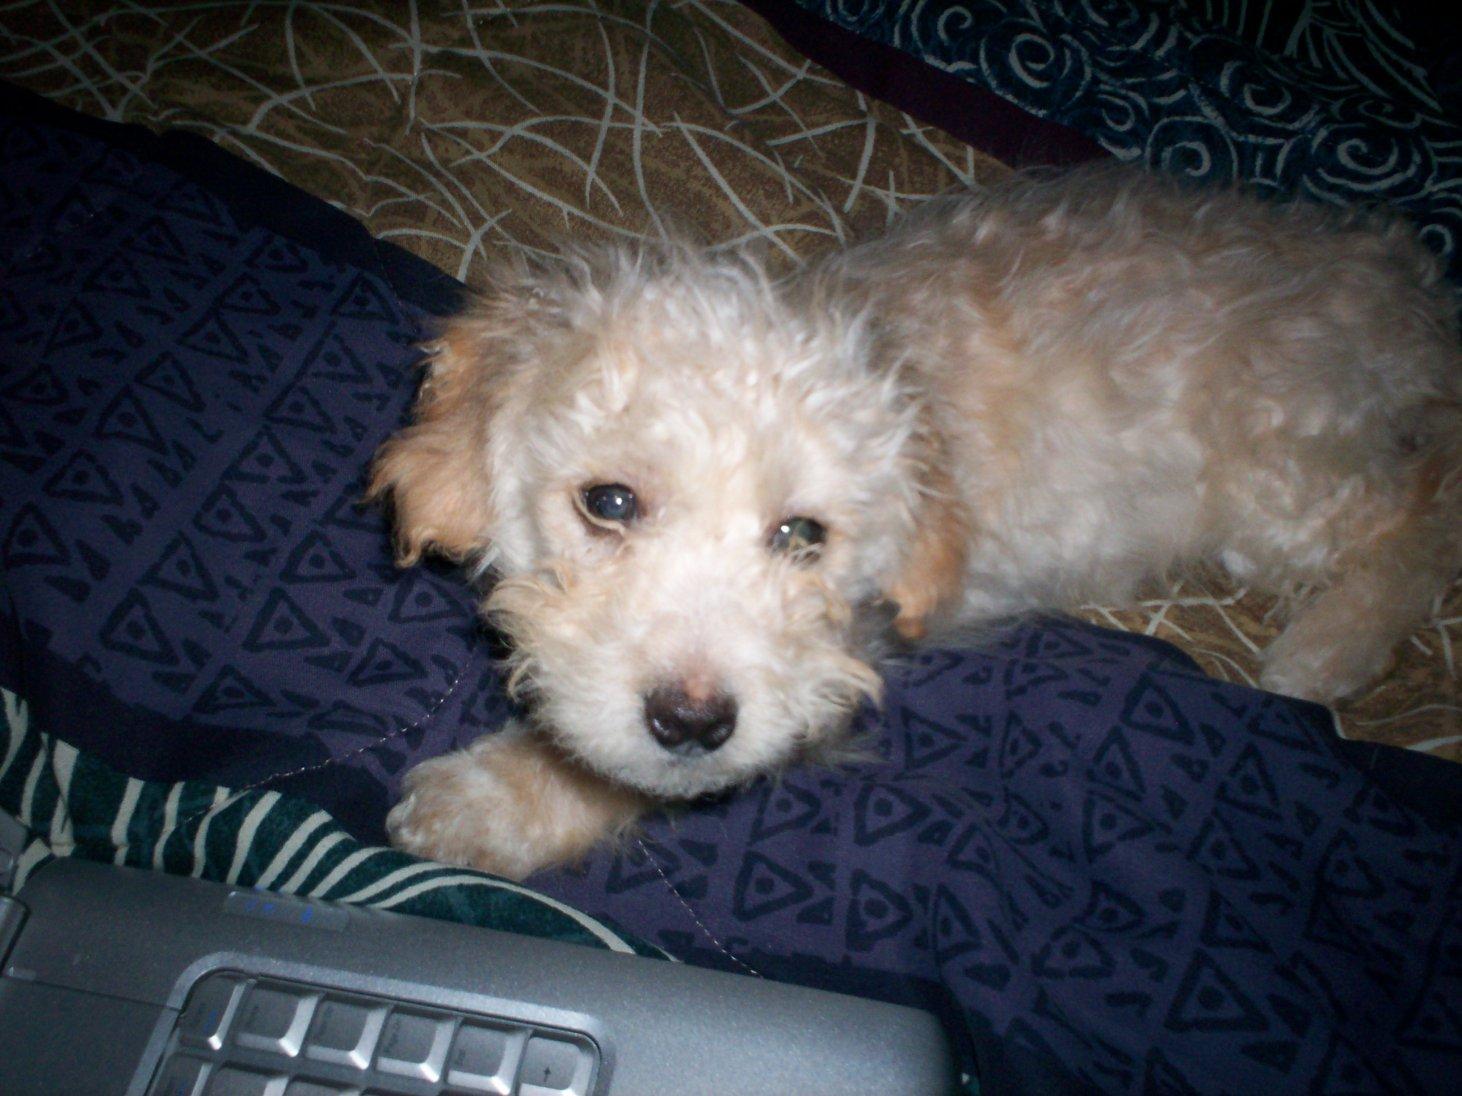 Terrier poodle